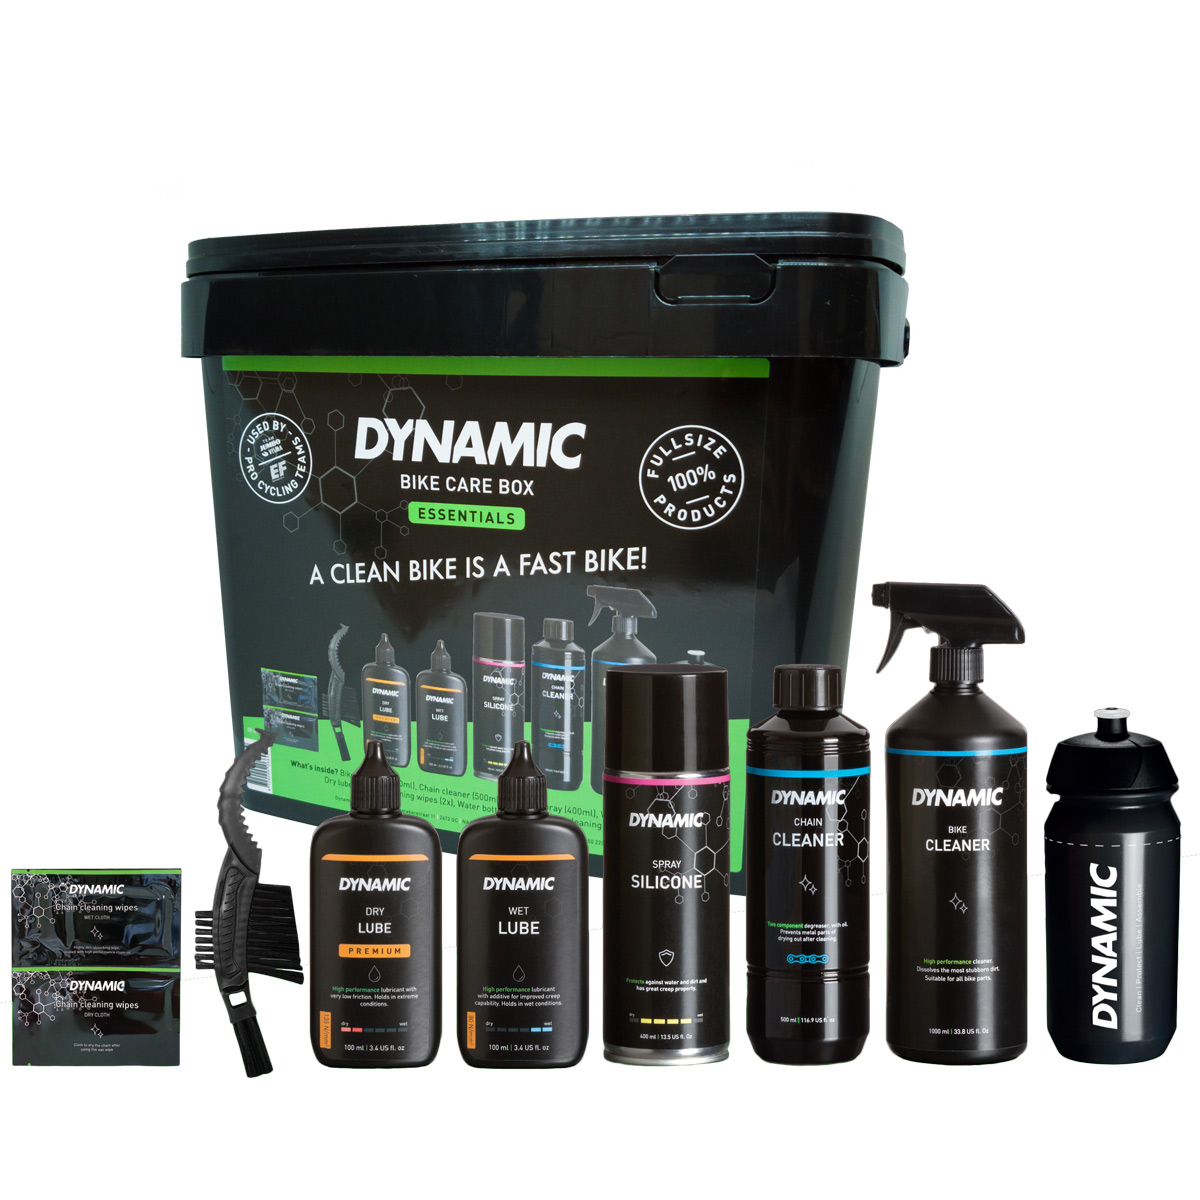 Dynamic Bike Care Box - Fahrradpflege-Set 10-teilig